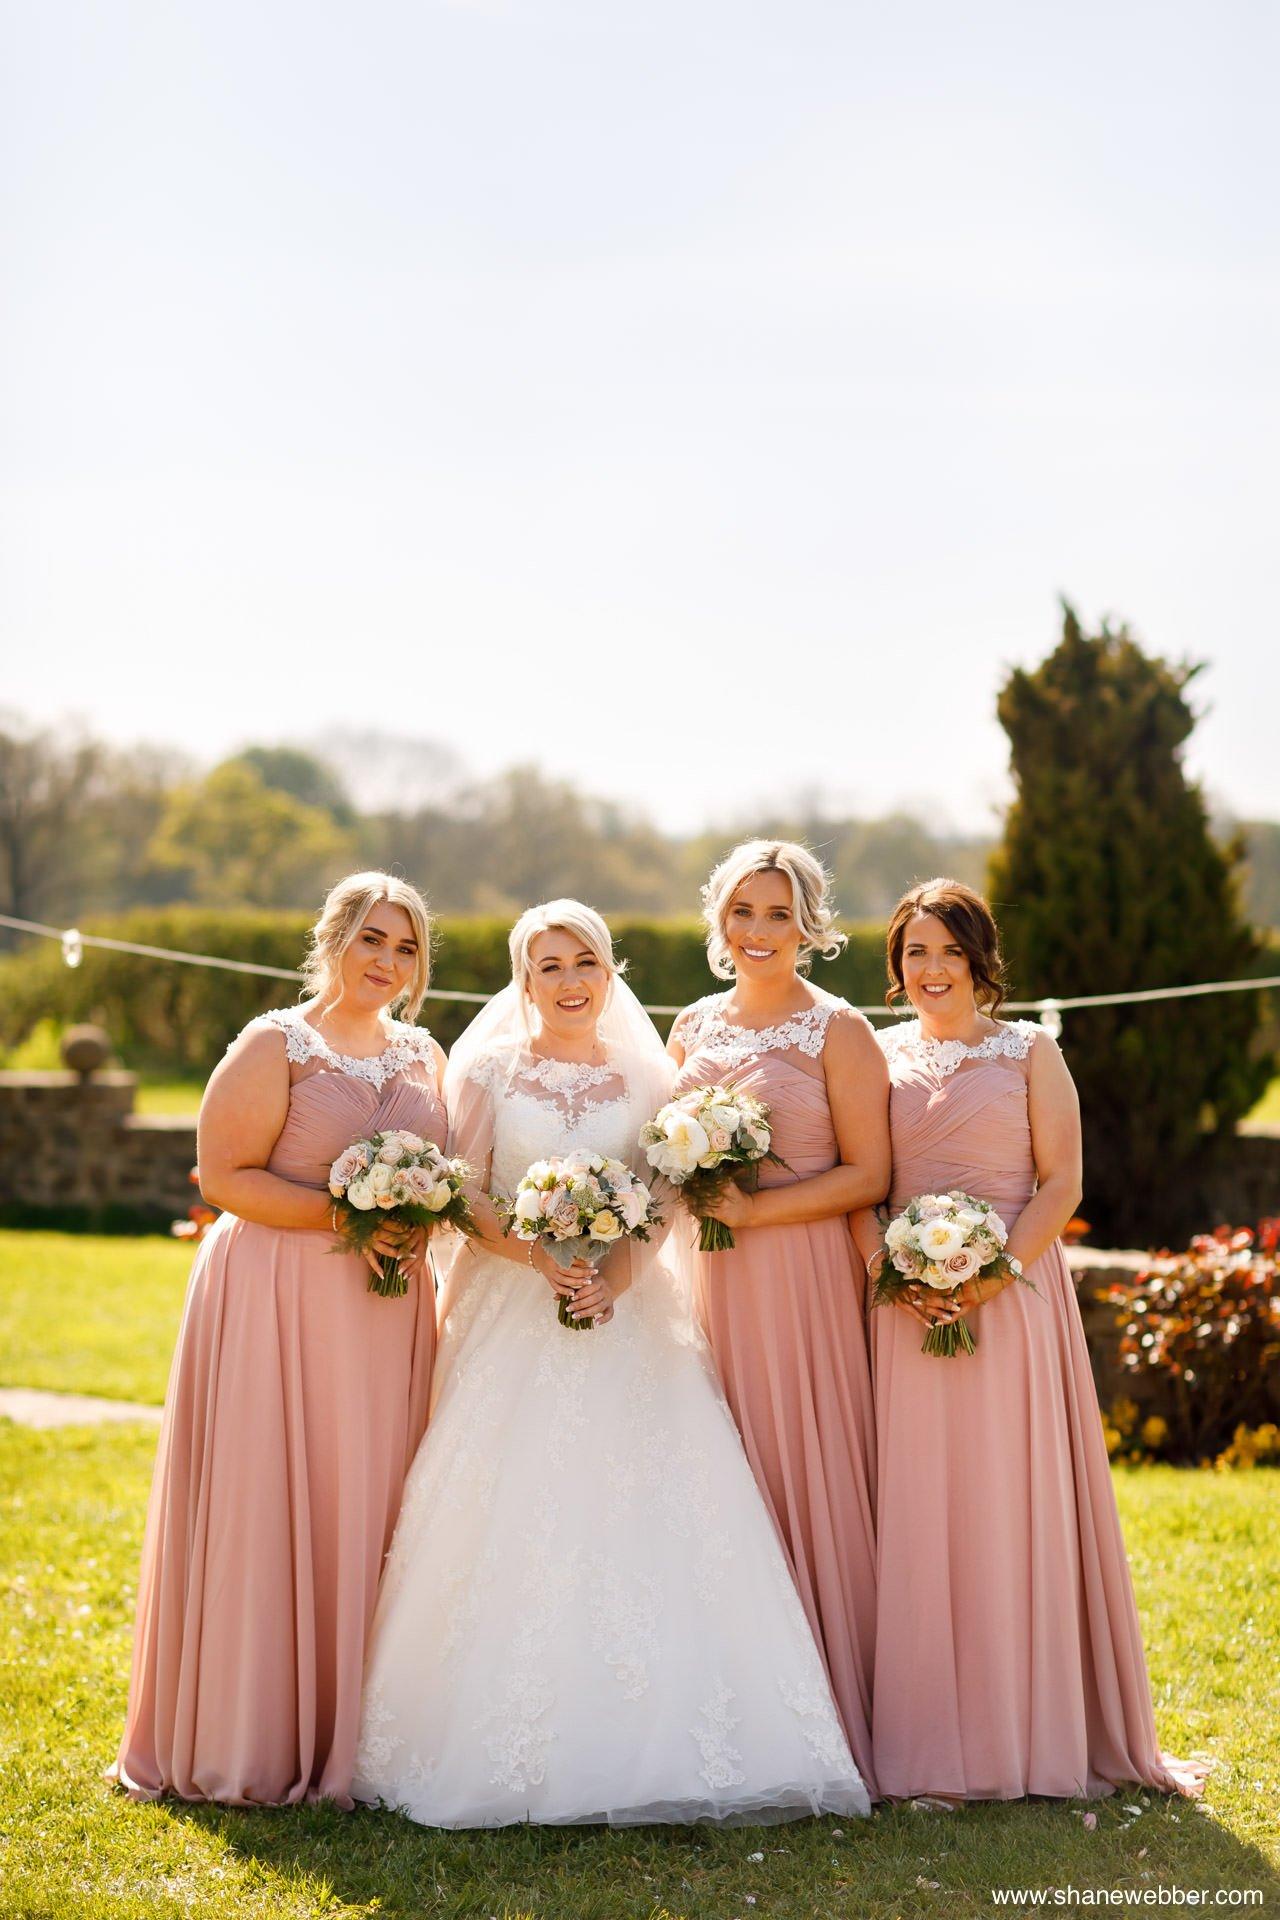 Wedding group photos at Beeston Manor